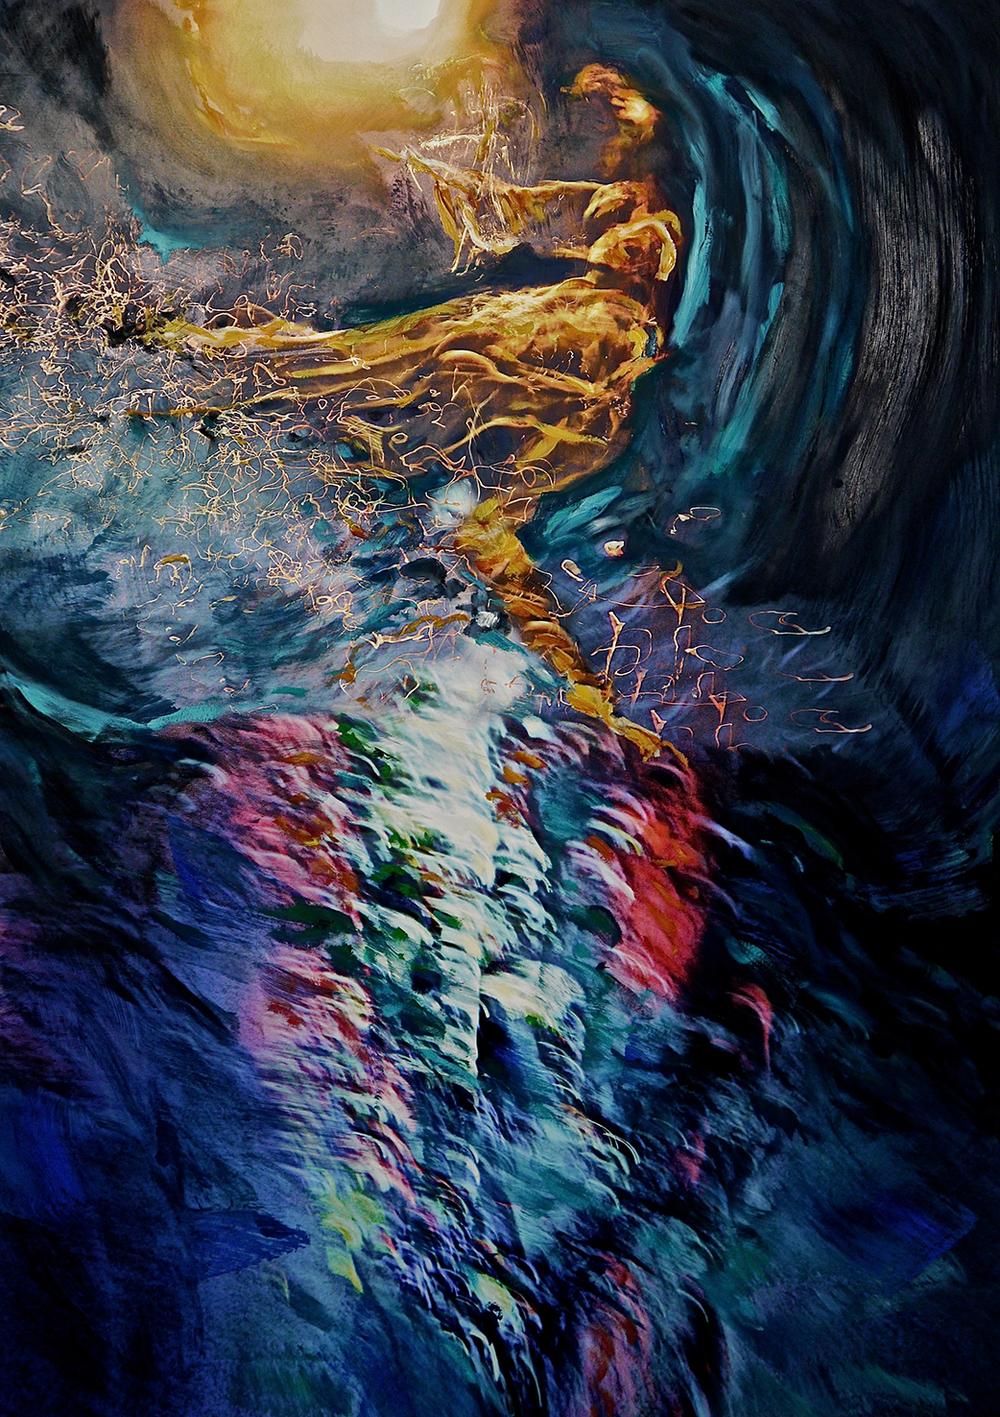 Andrew Hart Adler  Aqua Lady V  Mixed media and digital print on canvas  192 x 137 cm